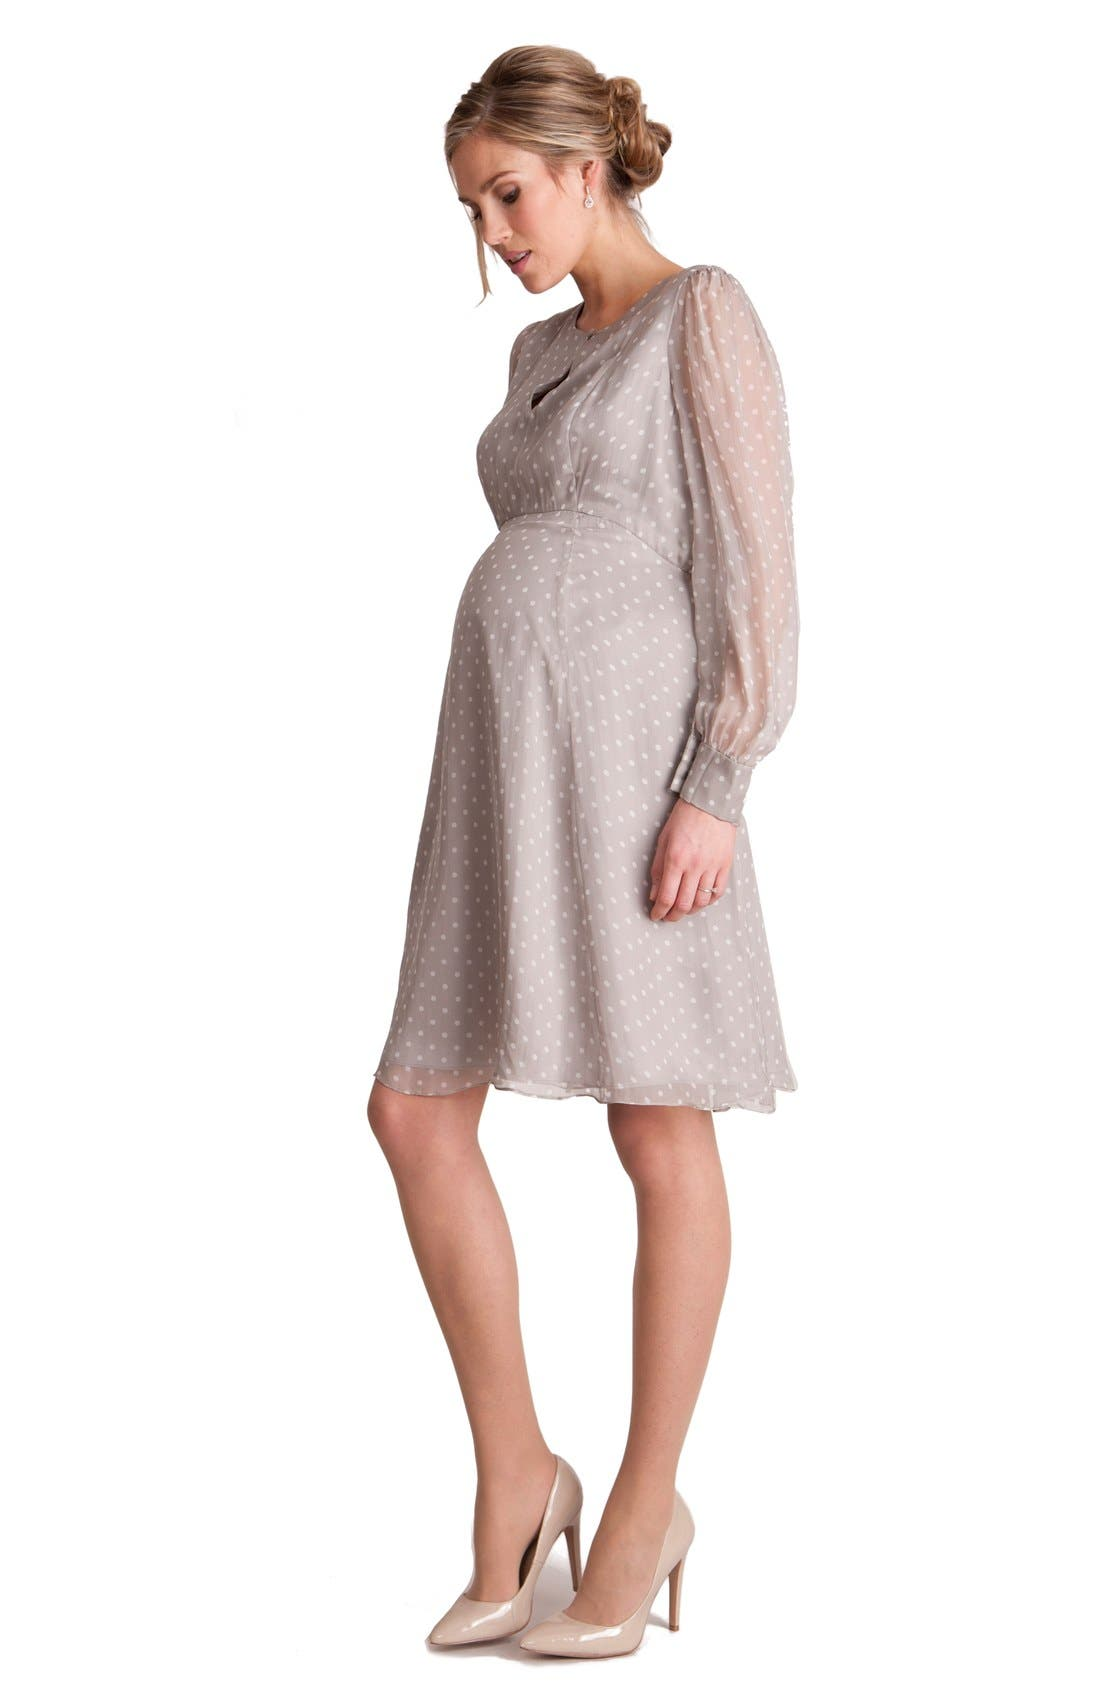 Main Image - Seraphine'EldoraLuxe' Maternity Dress